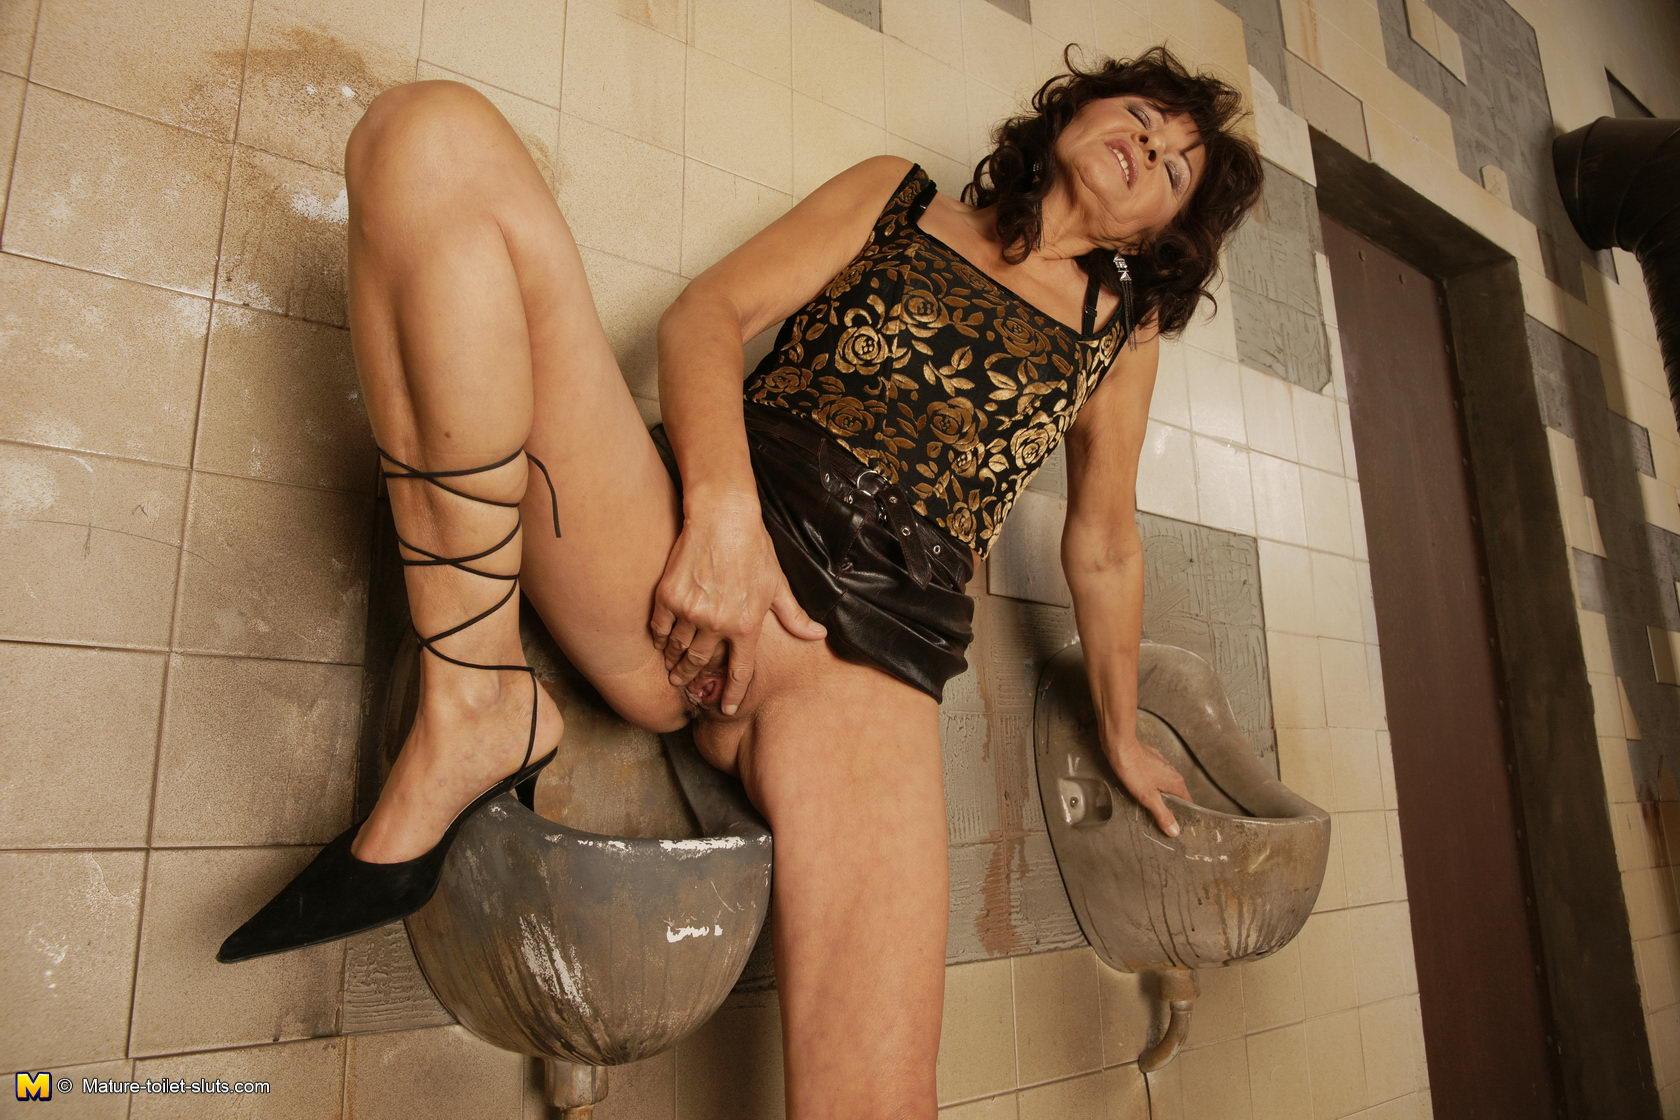 Секс на туалет 1 фотография